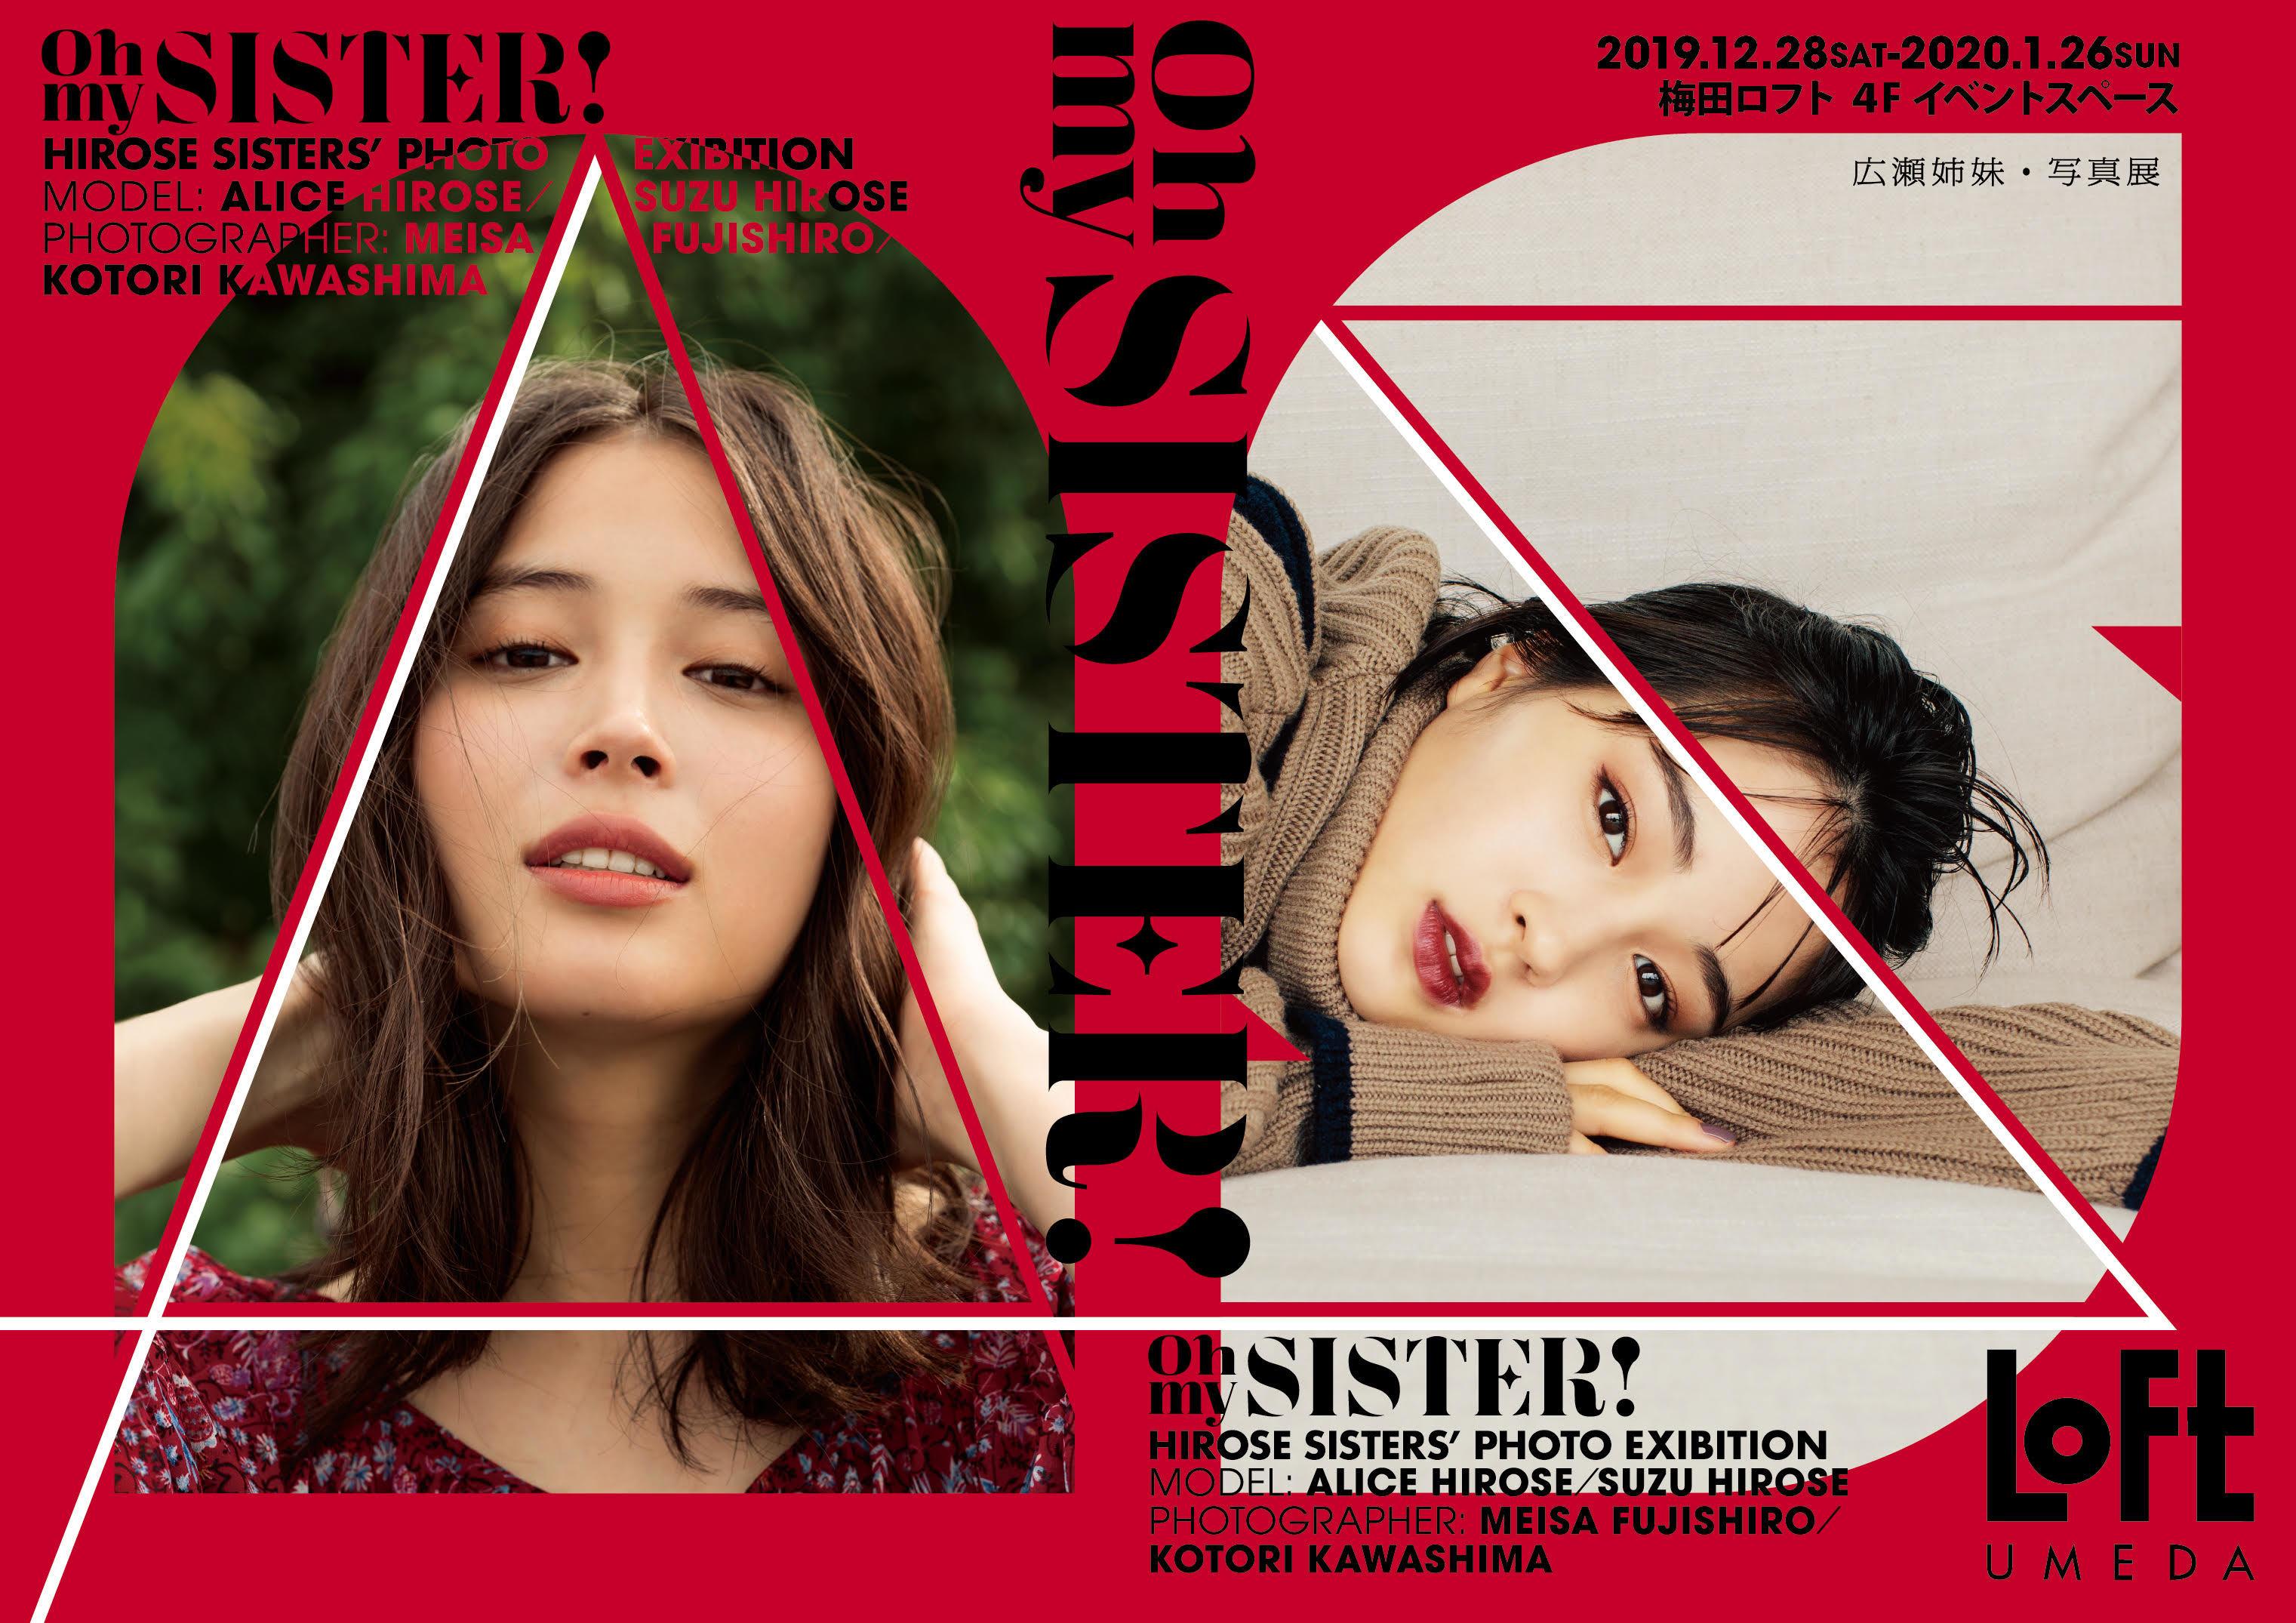 『OH MY SISTER! -広瀬姉妹・写真展-』